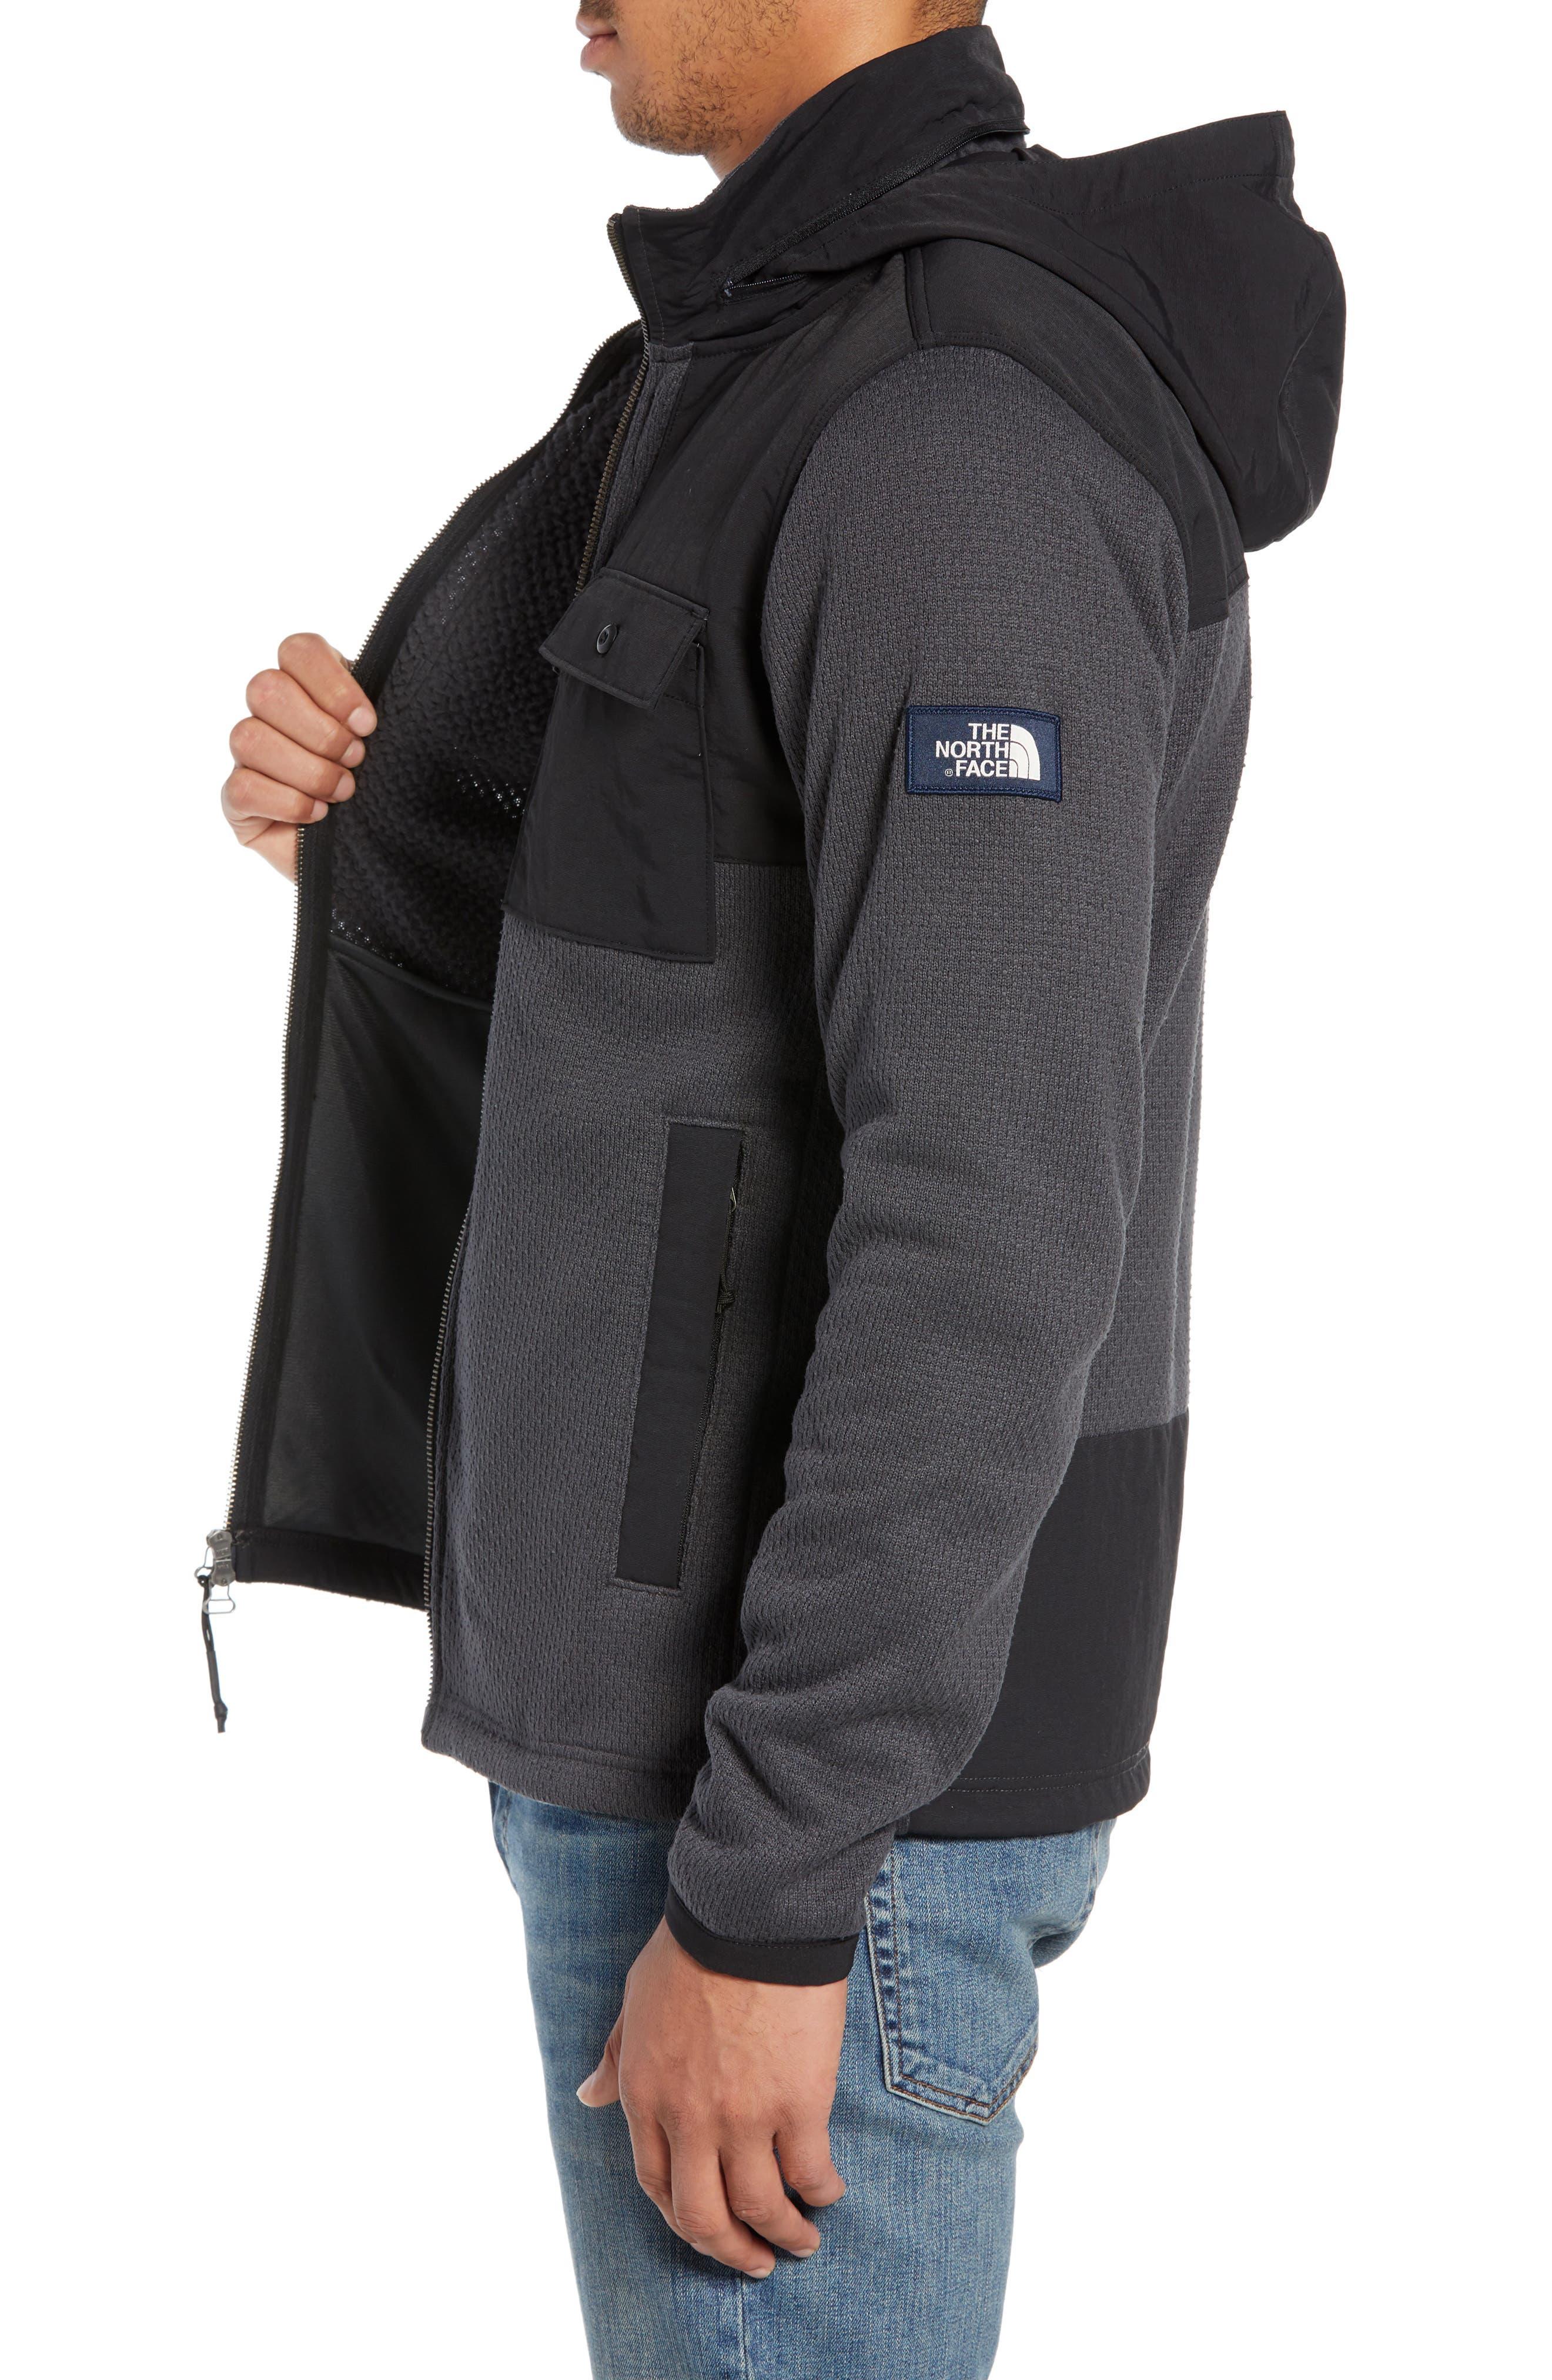 Be-Layed Back Jacket,                             Alternate thumbnail 3, color,                             ASPHALT GREY